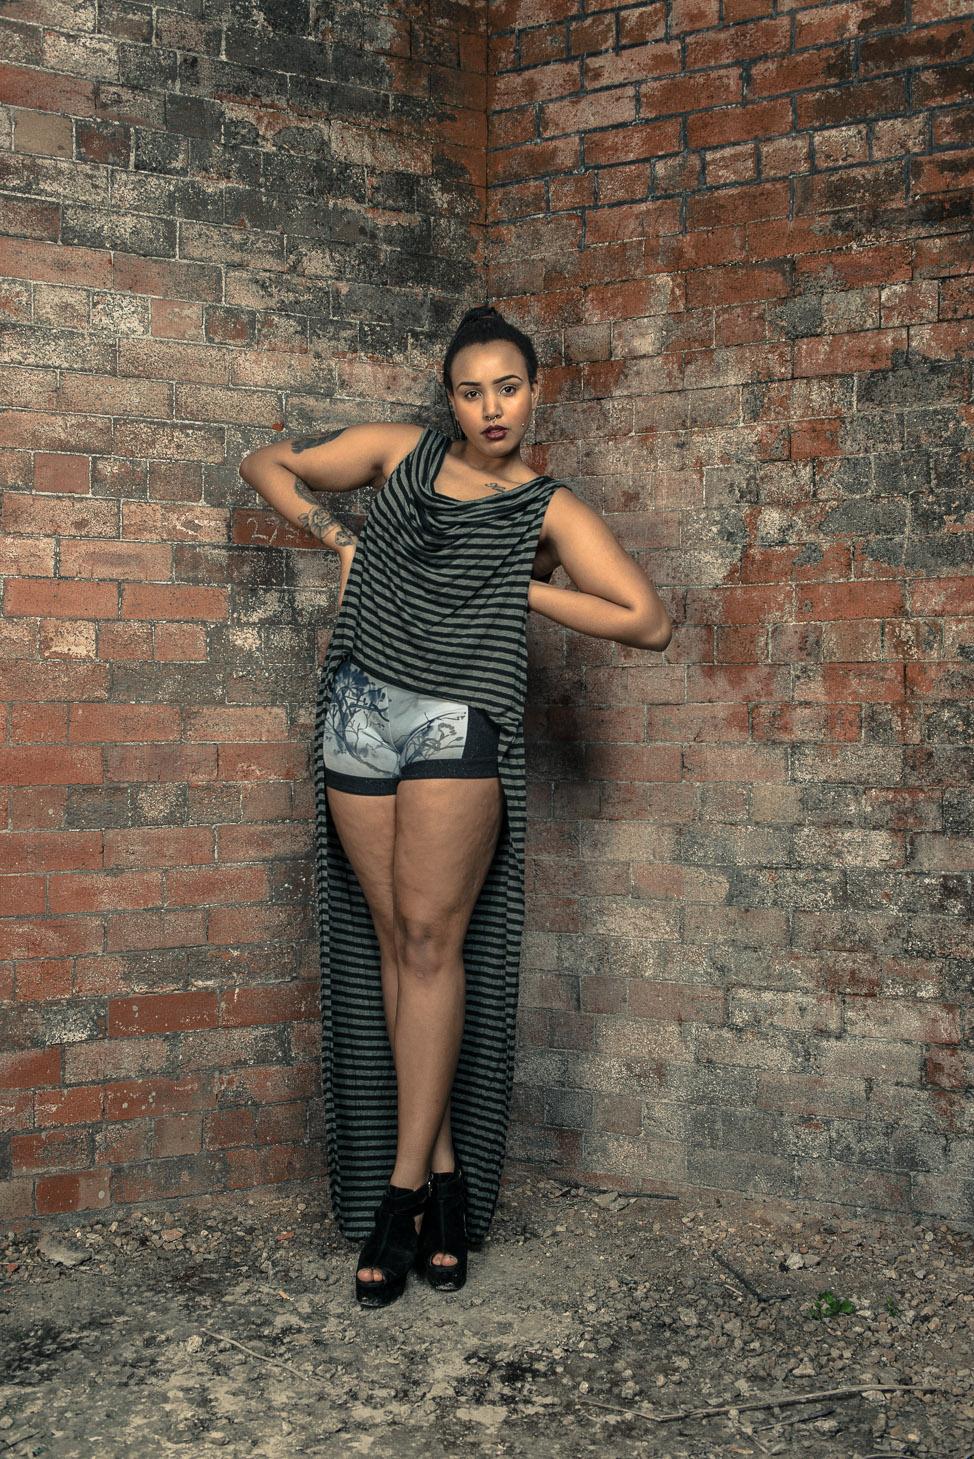 zaramia-ava-zaramiaava-leeds-fashion-designer-ethical-sustainable-tailored-minimalist-stripe-bodysuit-versatile-drape-dress-top-black-grey-print-belt-wrap-cowl-styling-bodysuit-womenswear-models-13